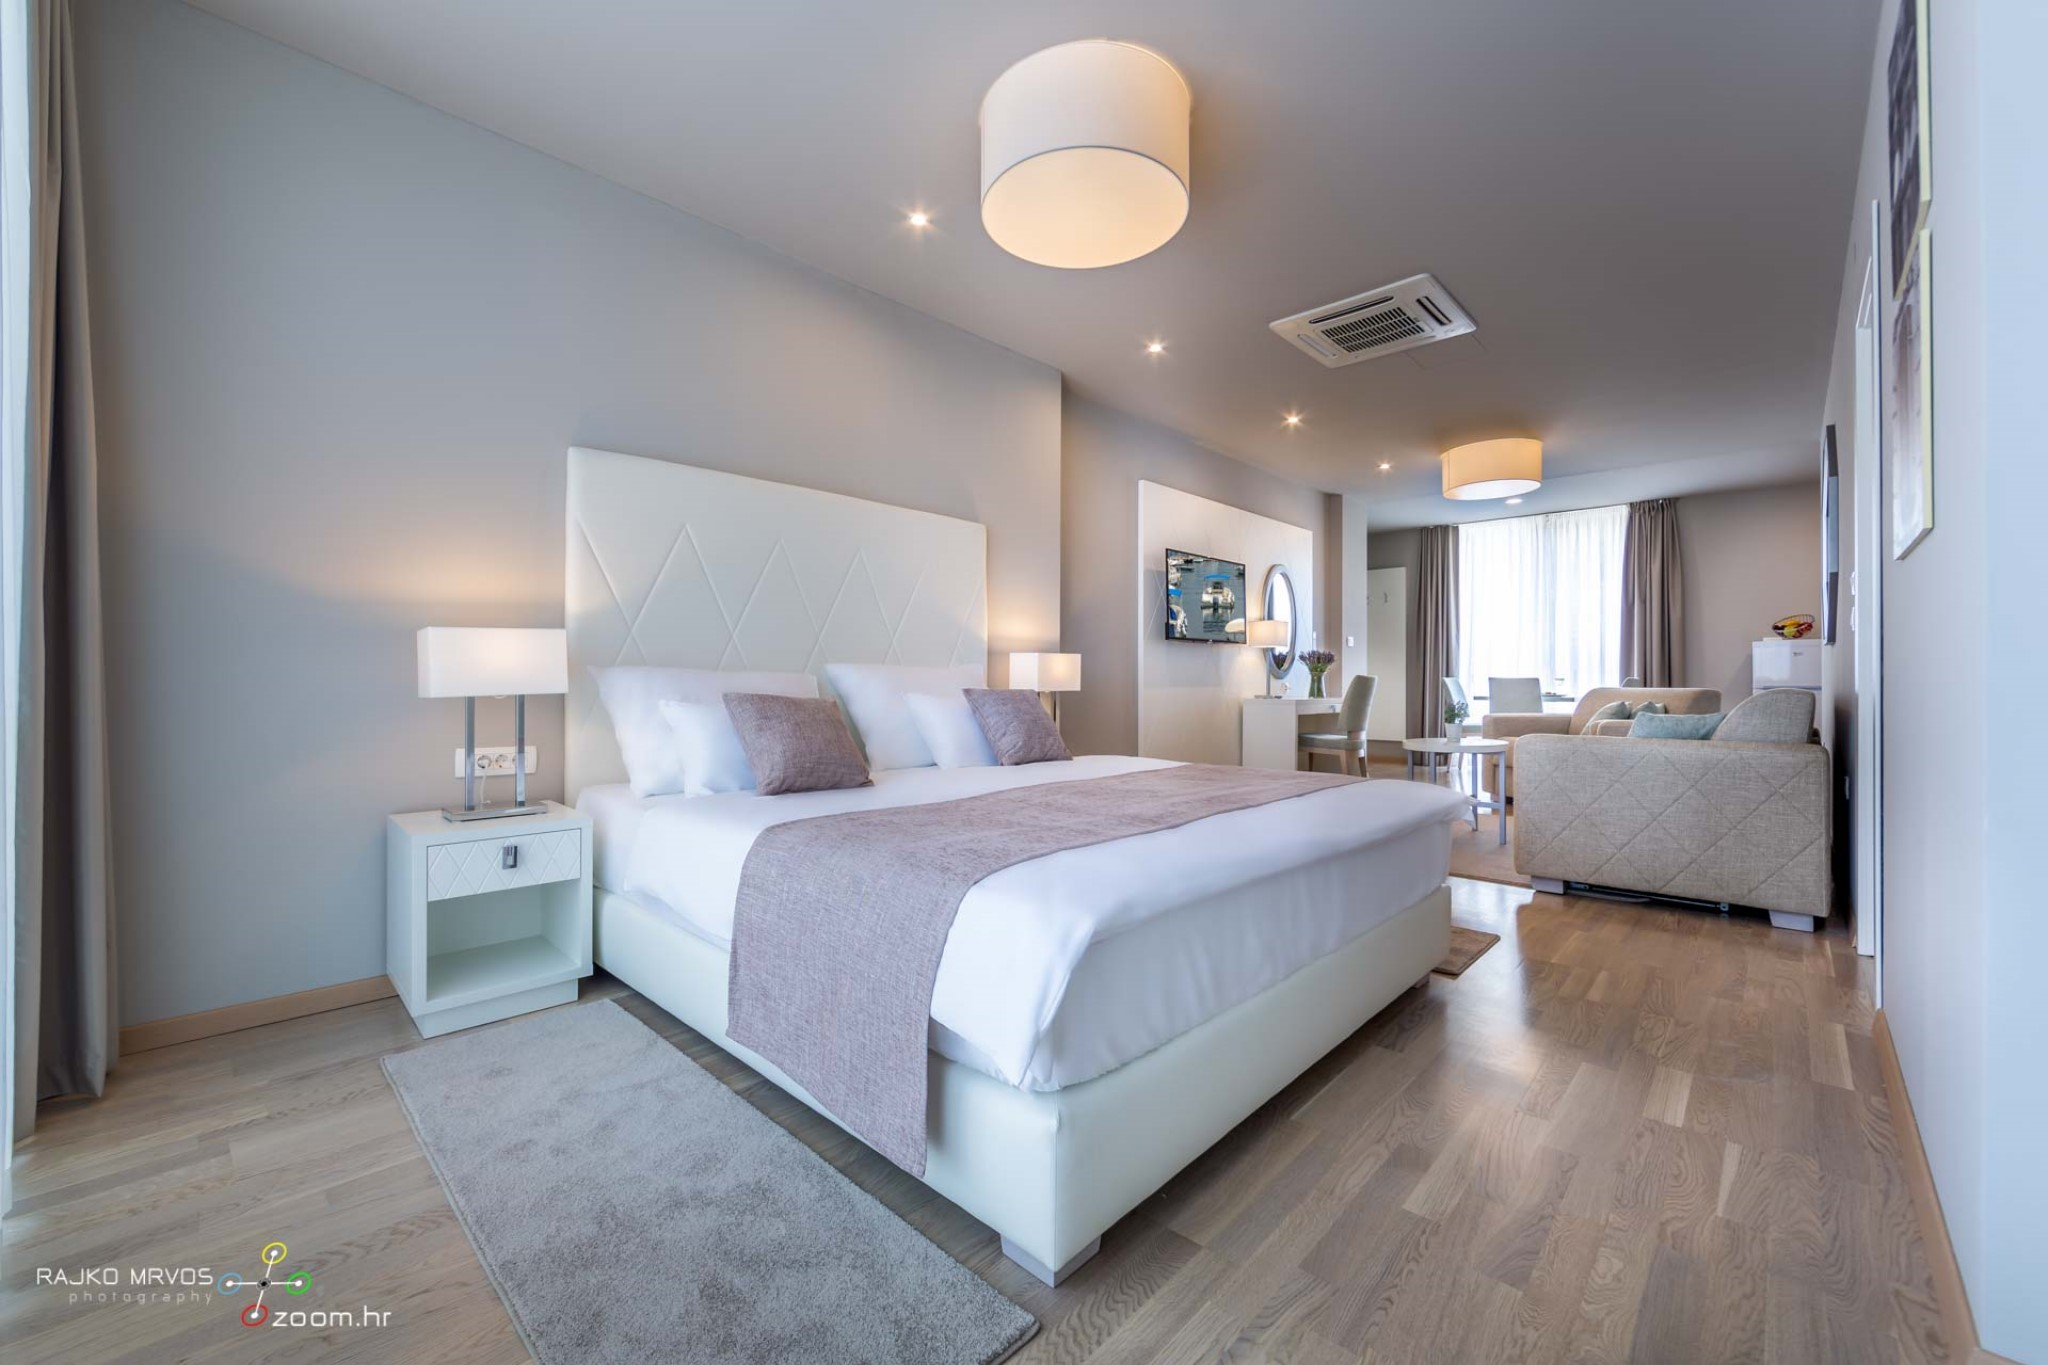 fotografiranje-interijera-fotograf-eksterijera-apartmana-vila-kuca-apartman-Preelook-36